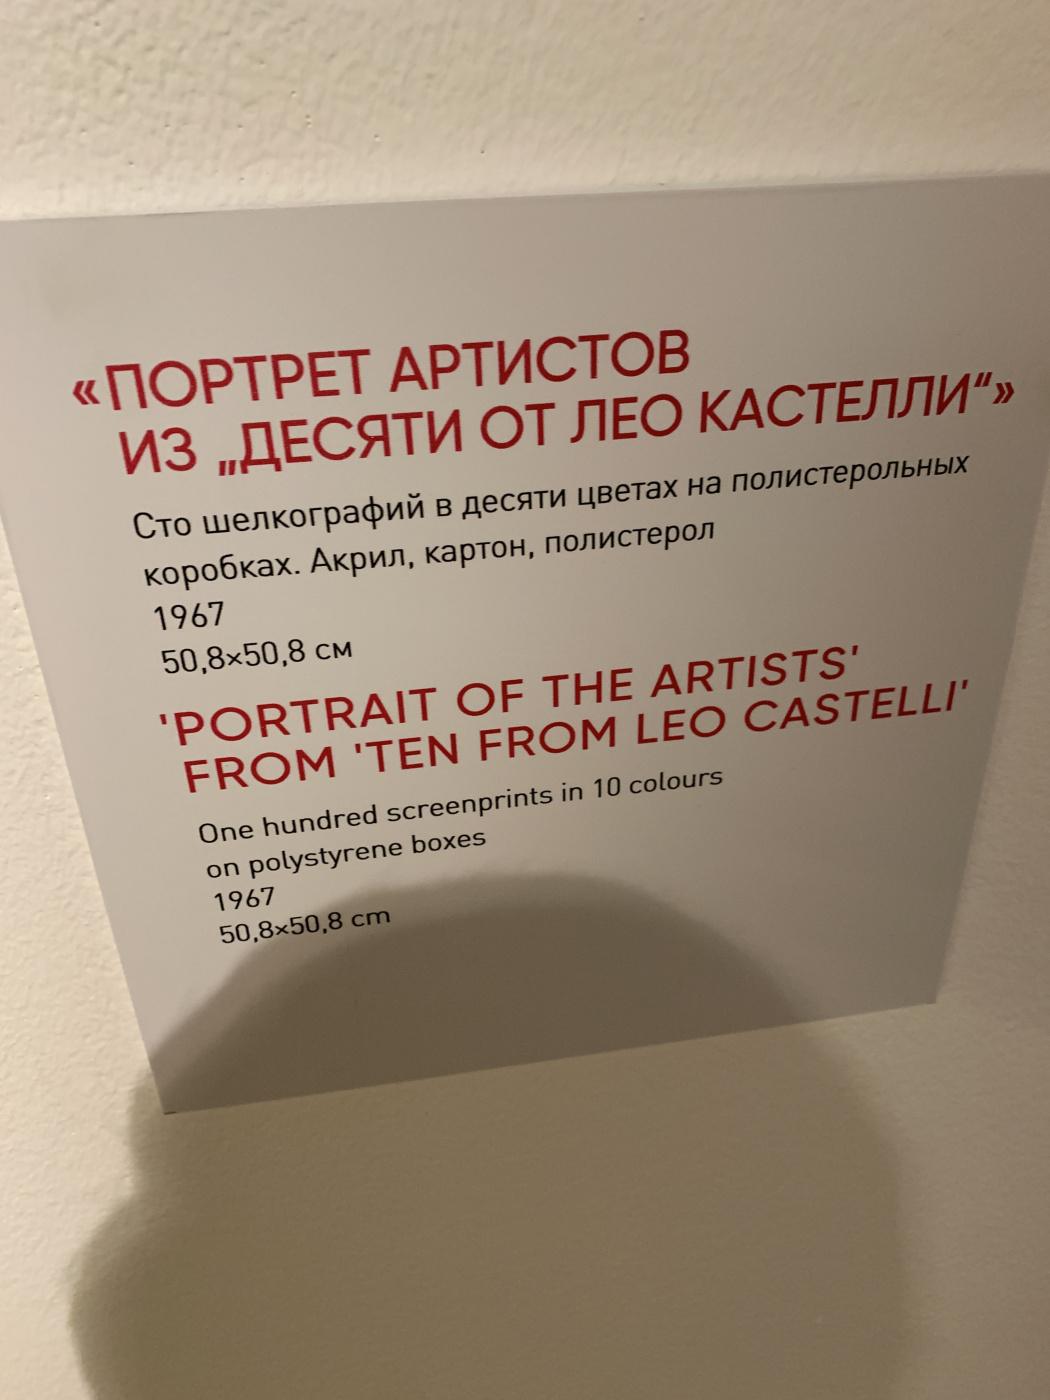 Portrait of artists from ten by Leo Castelli